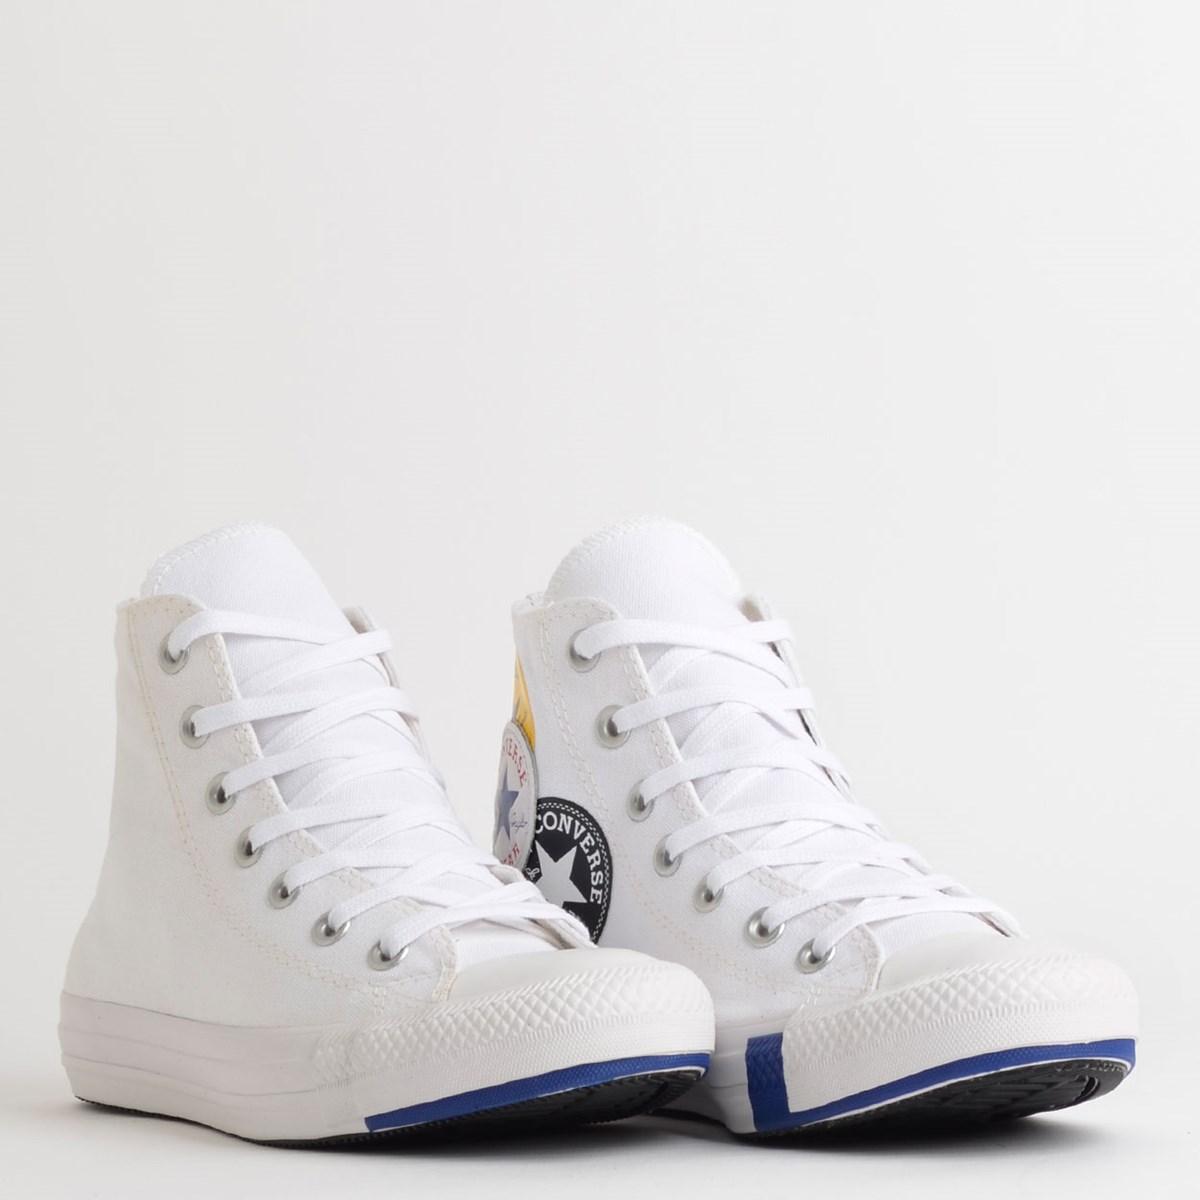 Tênis Converse Chuck Taylor All Star Logo Play Hi Branco Azul CT13230002